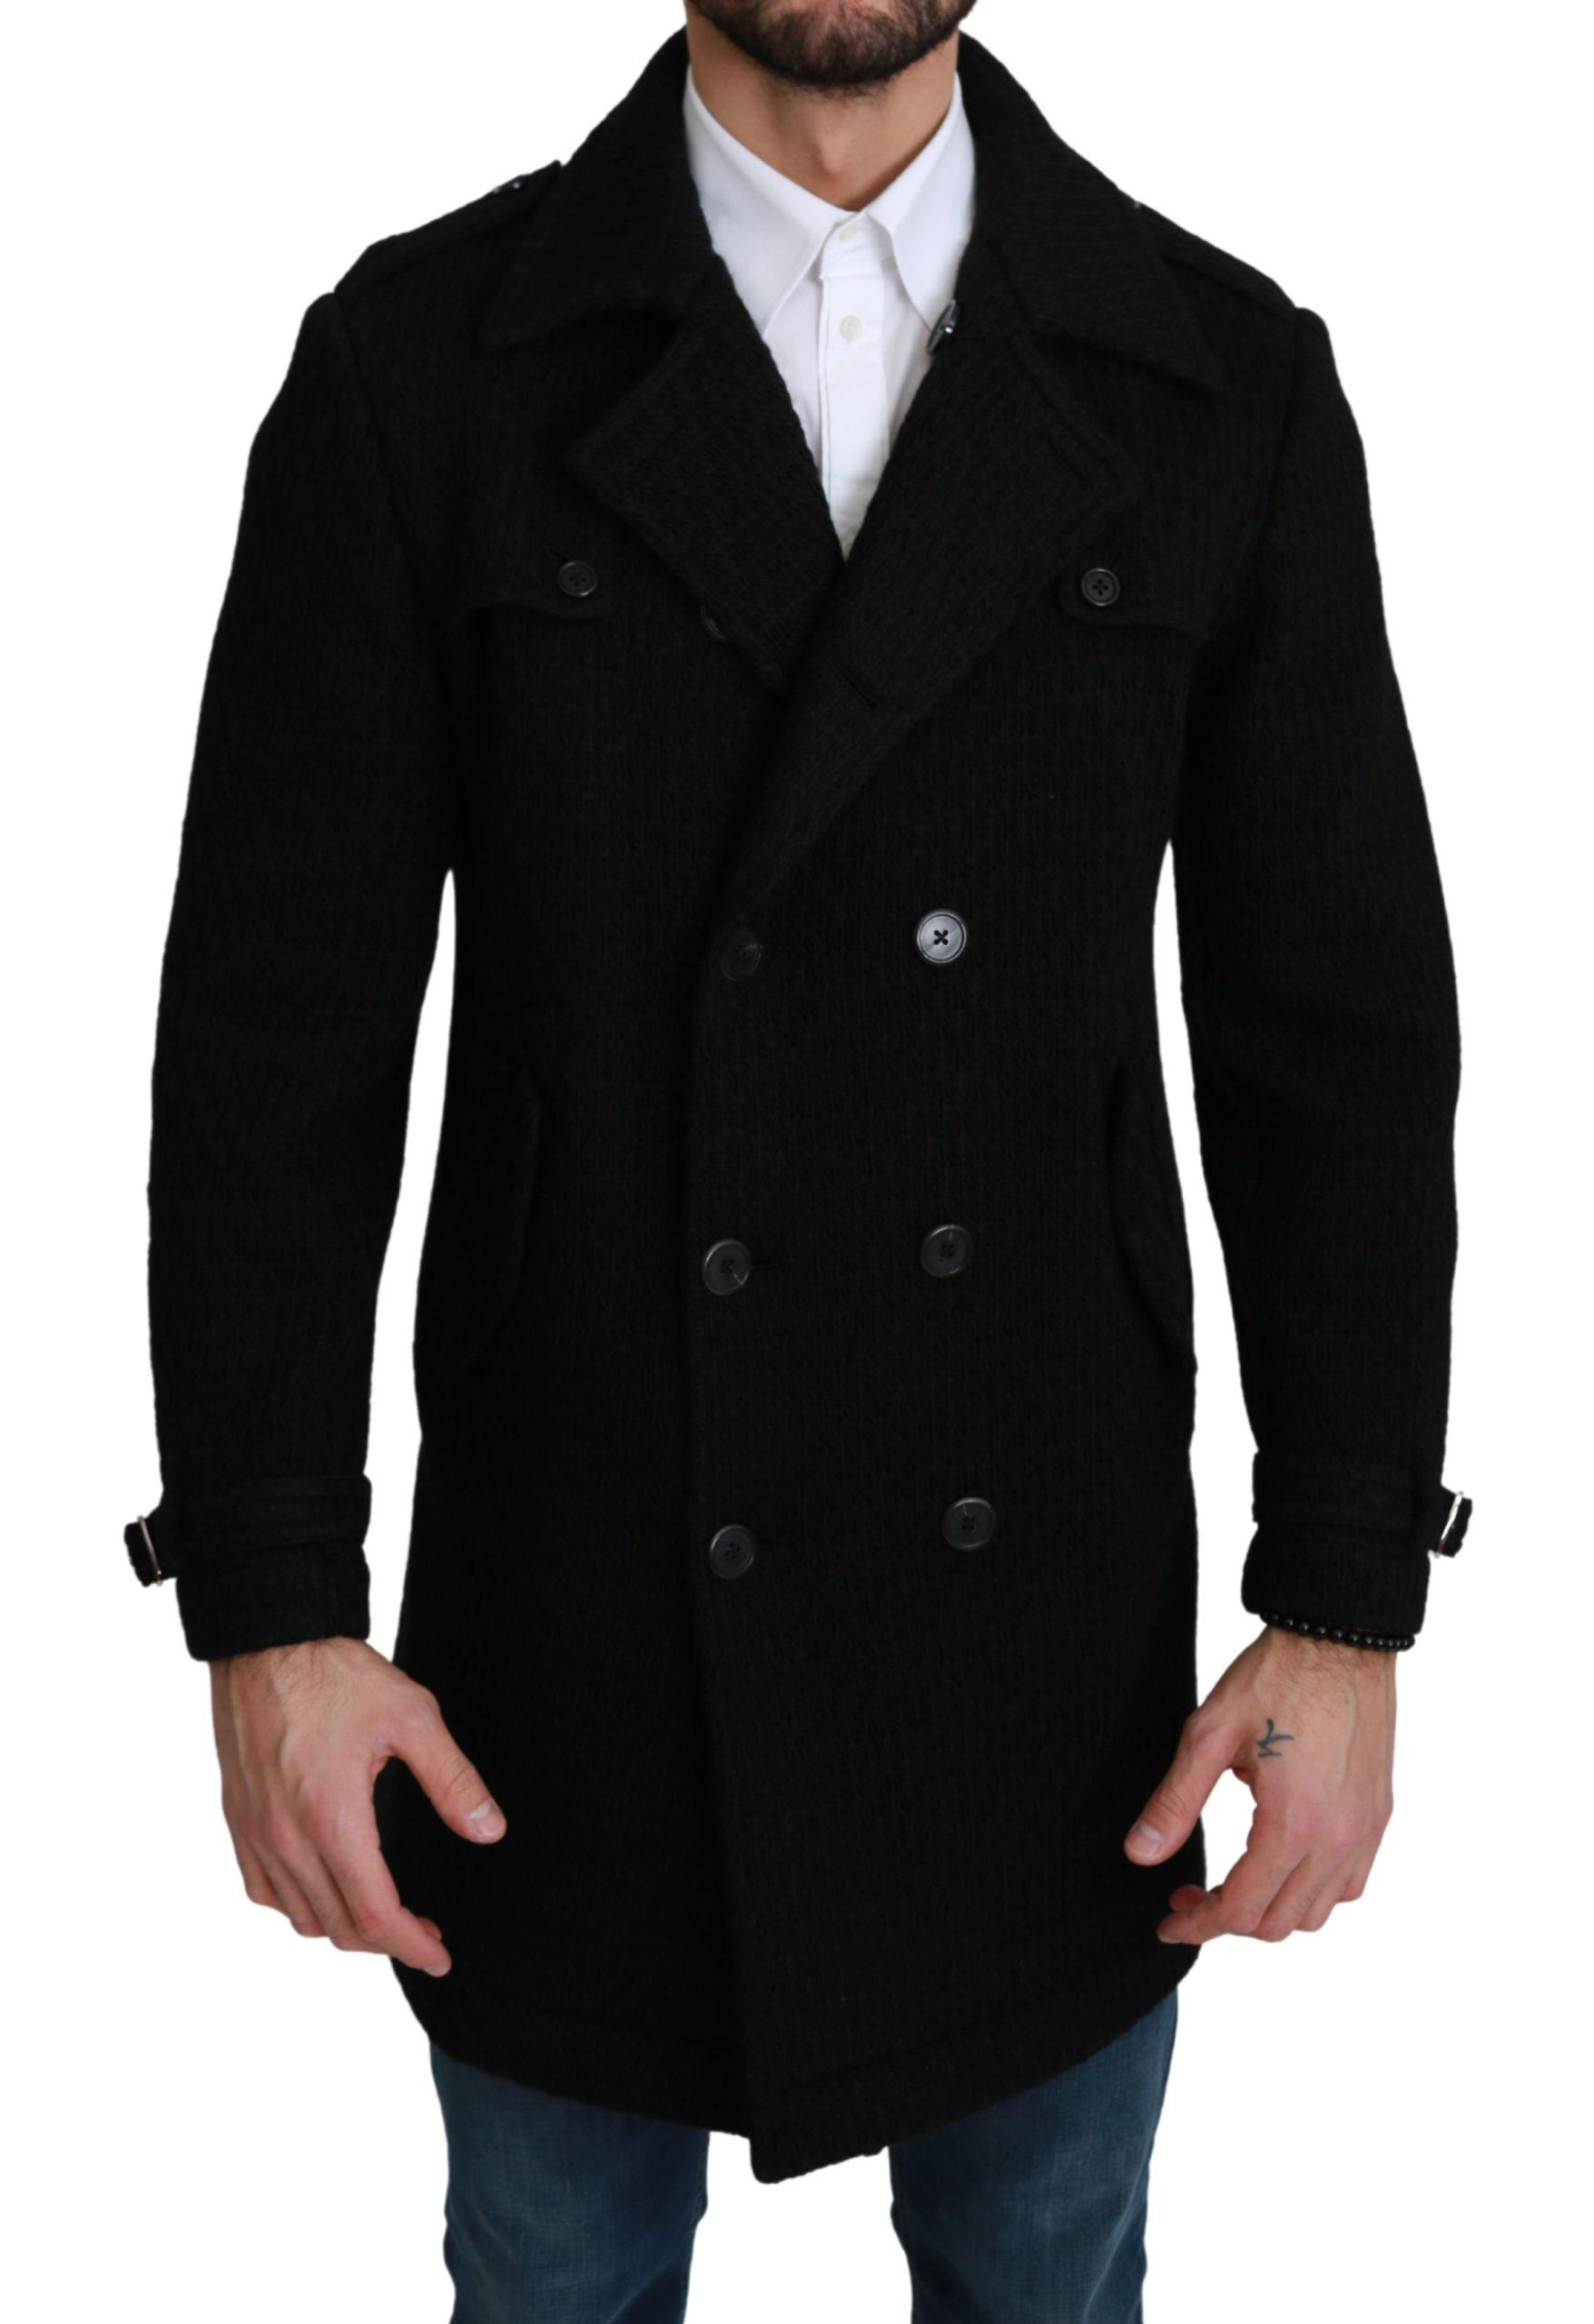 Dolce & Gabbana Men's Formal Virgin Wool Jacket Black KOS1750 - IT48   M